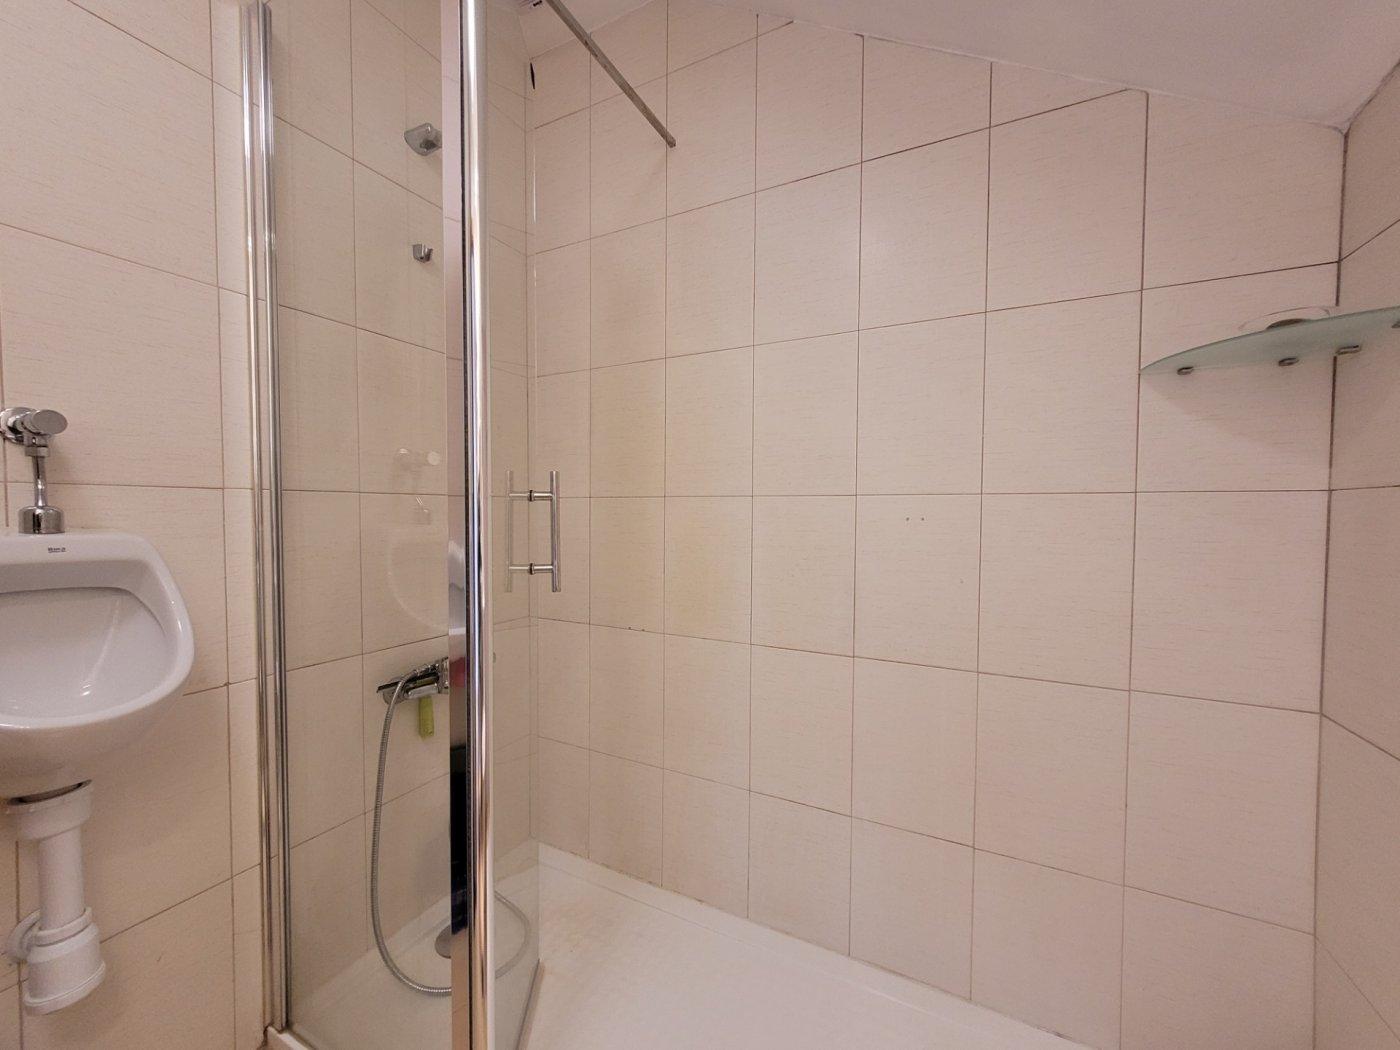 Gallery Image 10 of Apartment For rent in Condado De Alhama, Alhama De Murcia With Pool